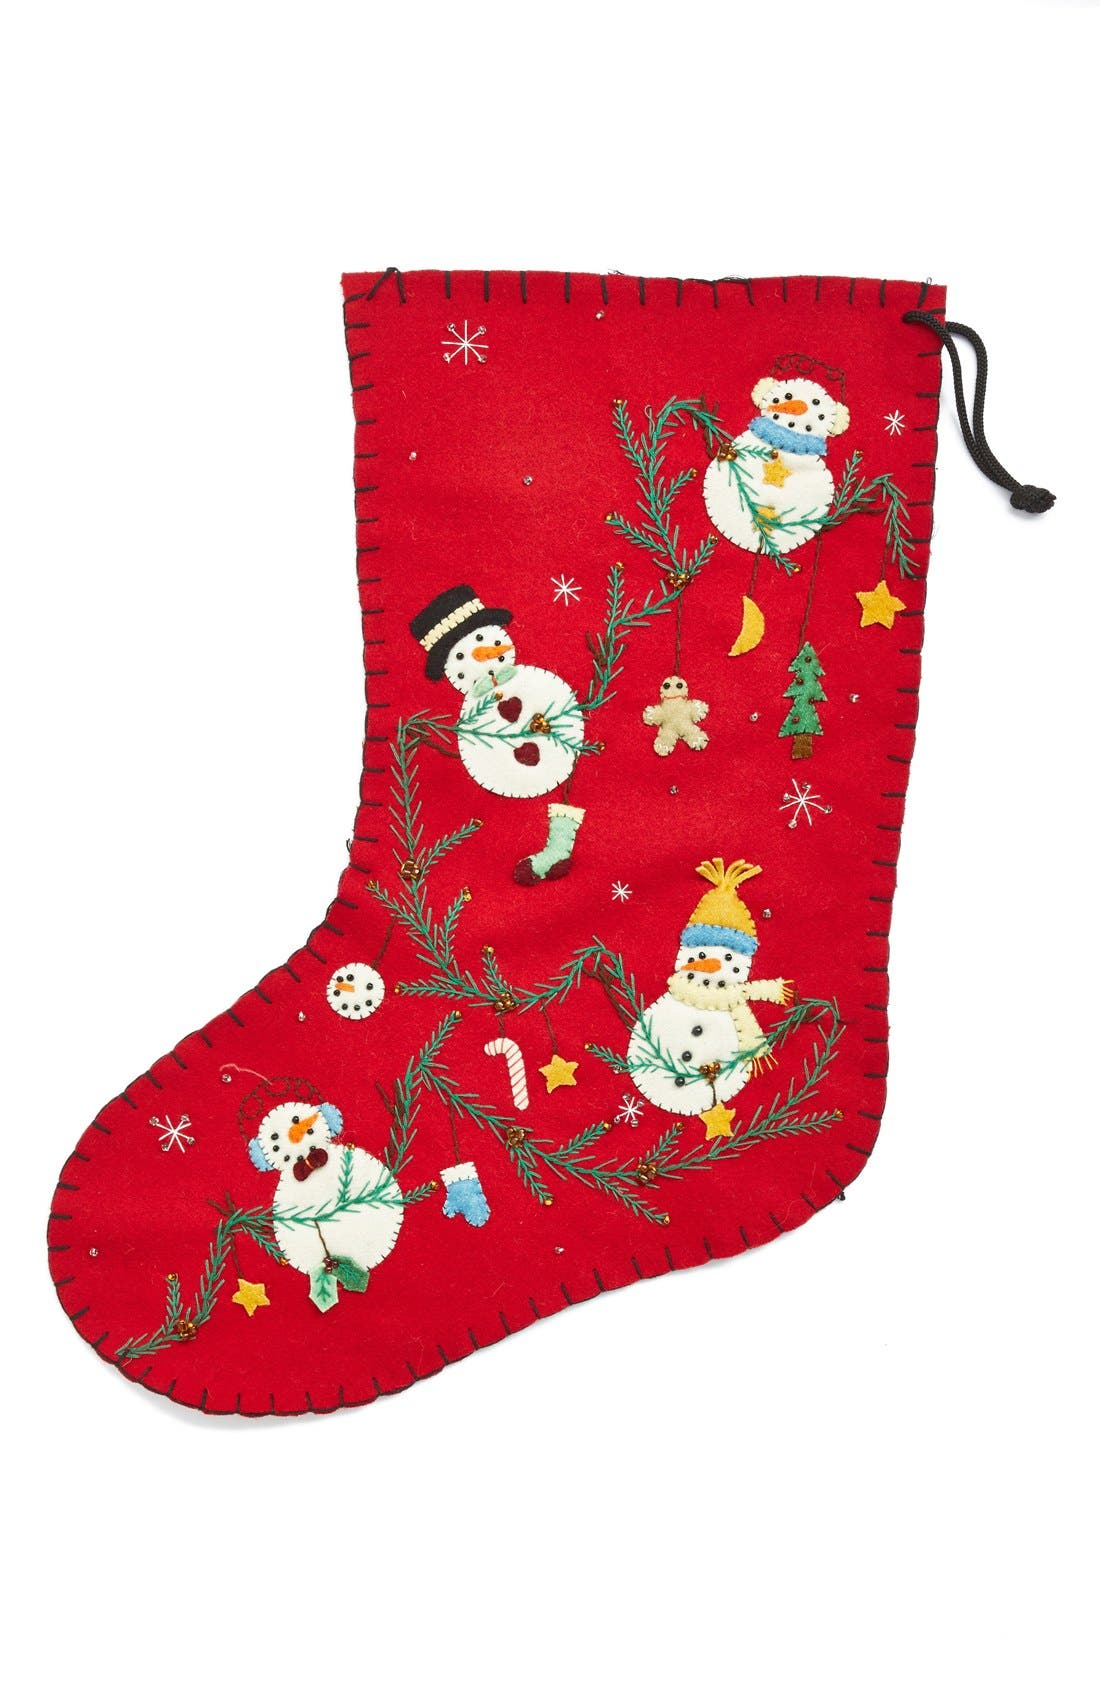 Christmas Stockings Christmas Decorations & Decor | Nordstrom